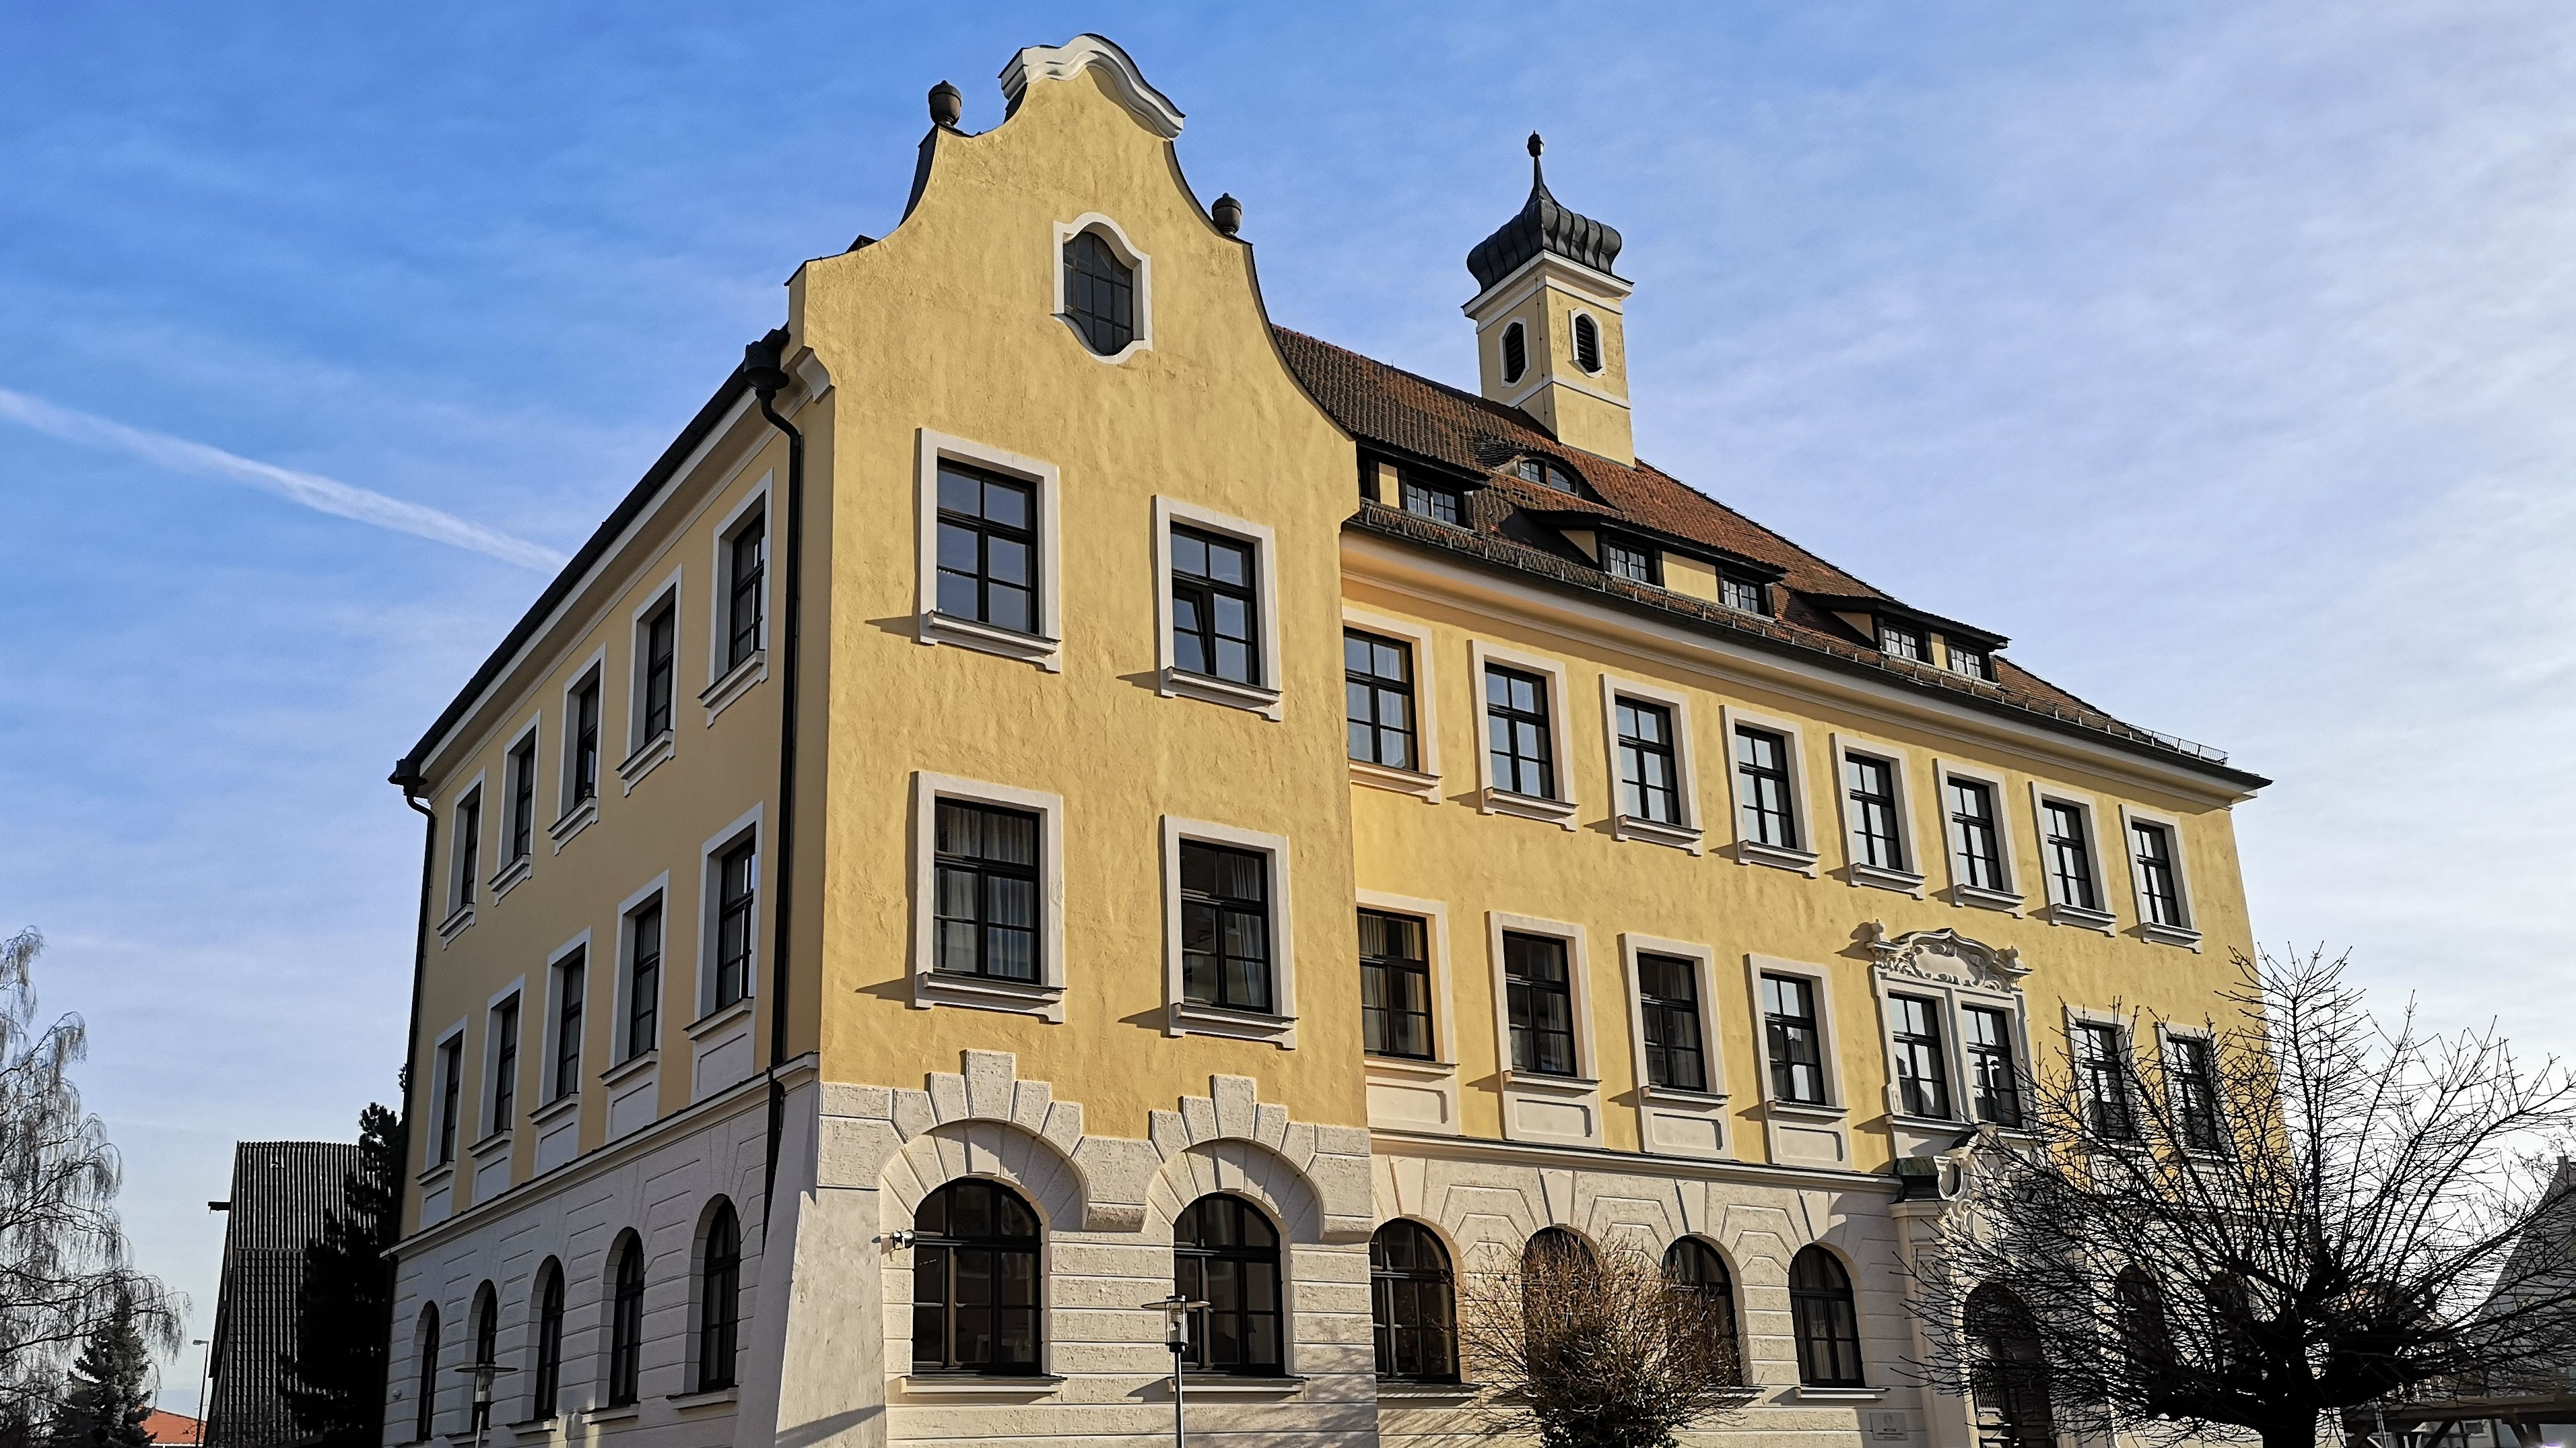 Schulgebäude in Lauingen (Schwaben)